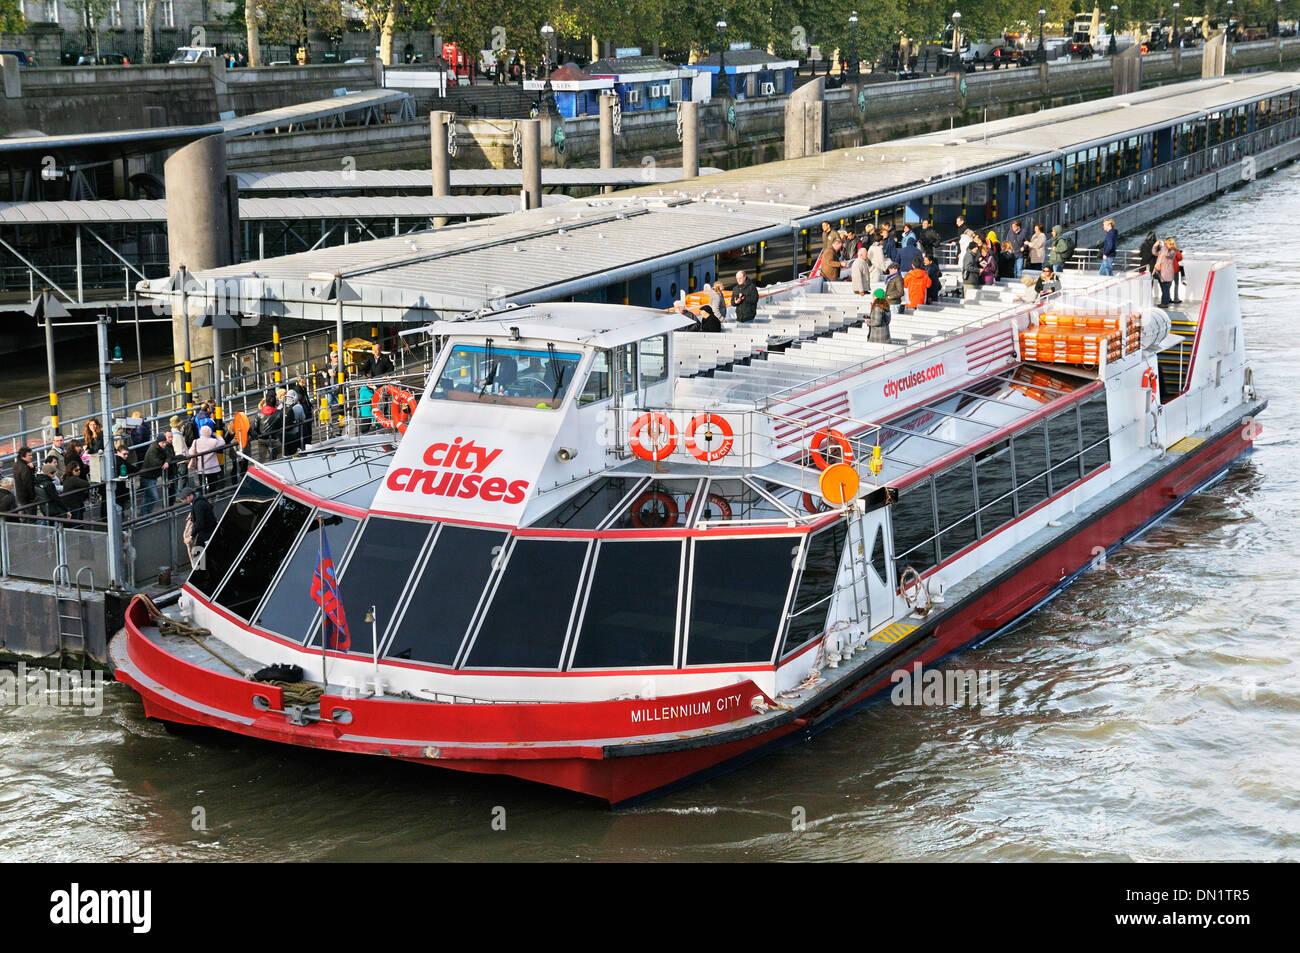 City Cruises boat on the River Thames, Victoria Embankment, London, England, UK - Stock Image